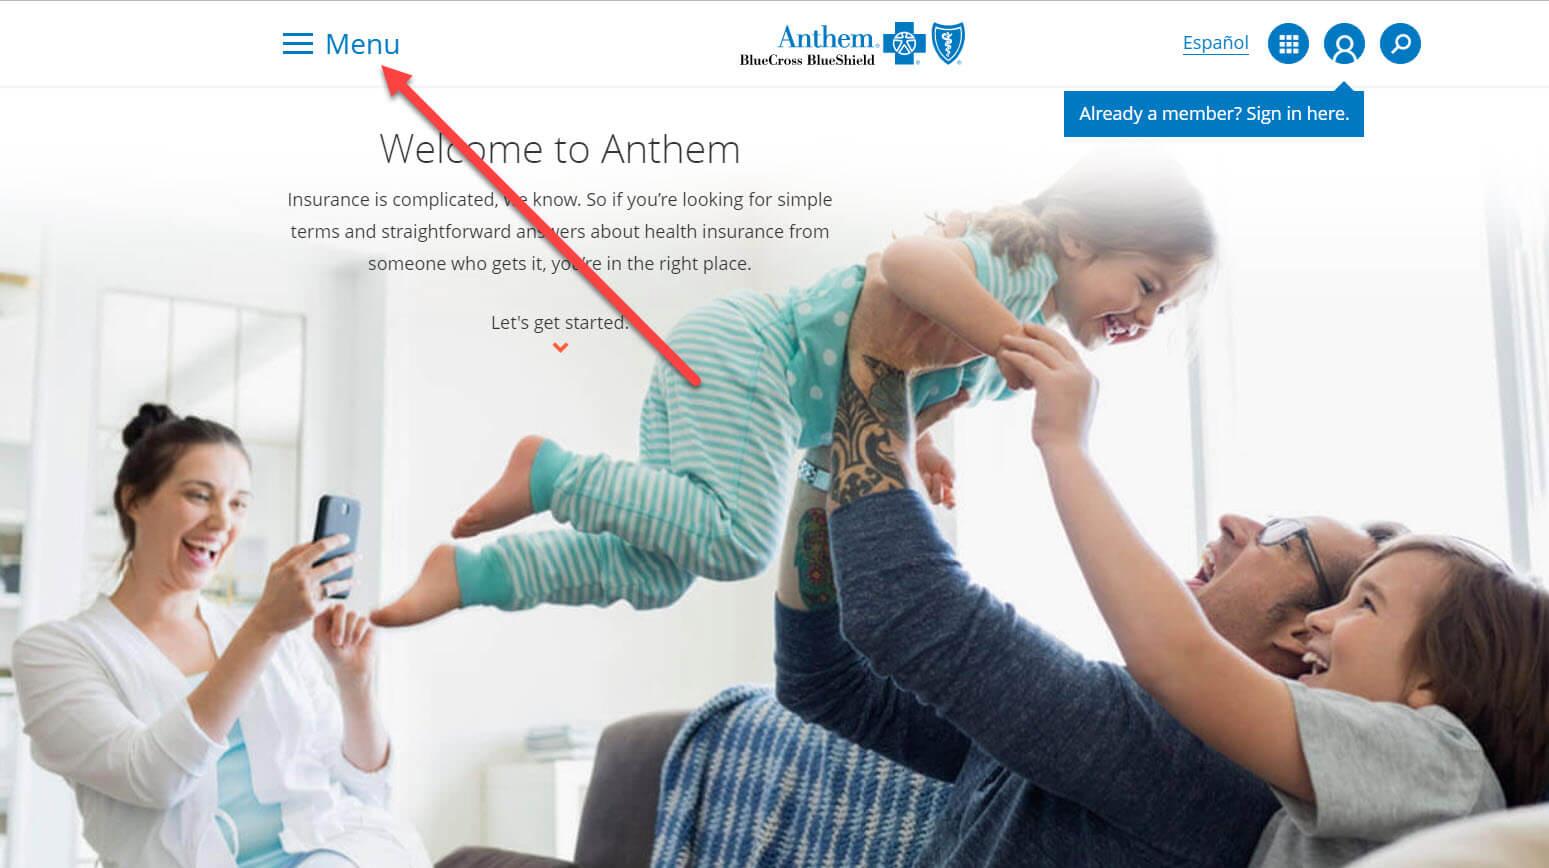 Anthemホームページ